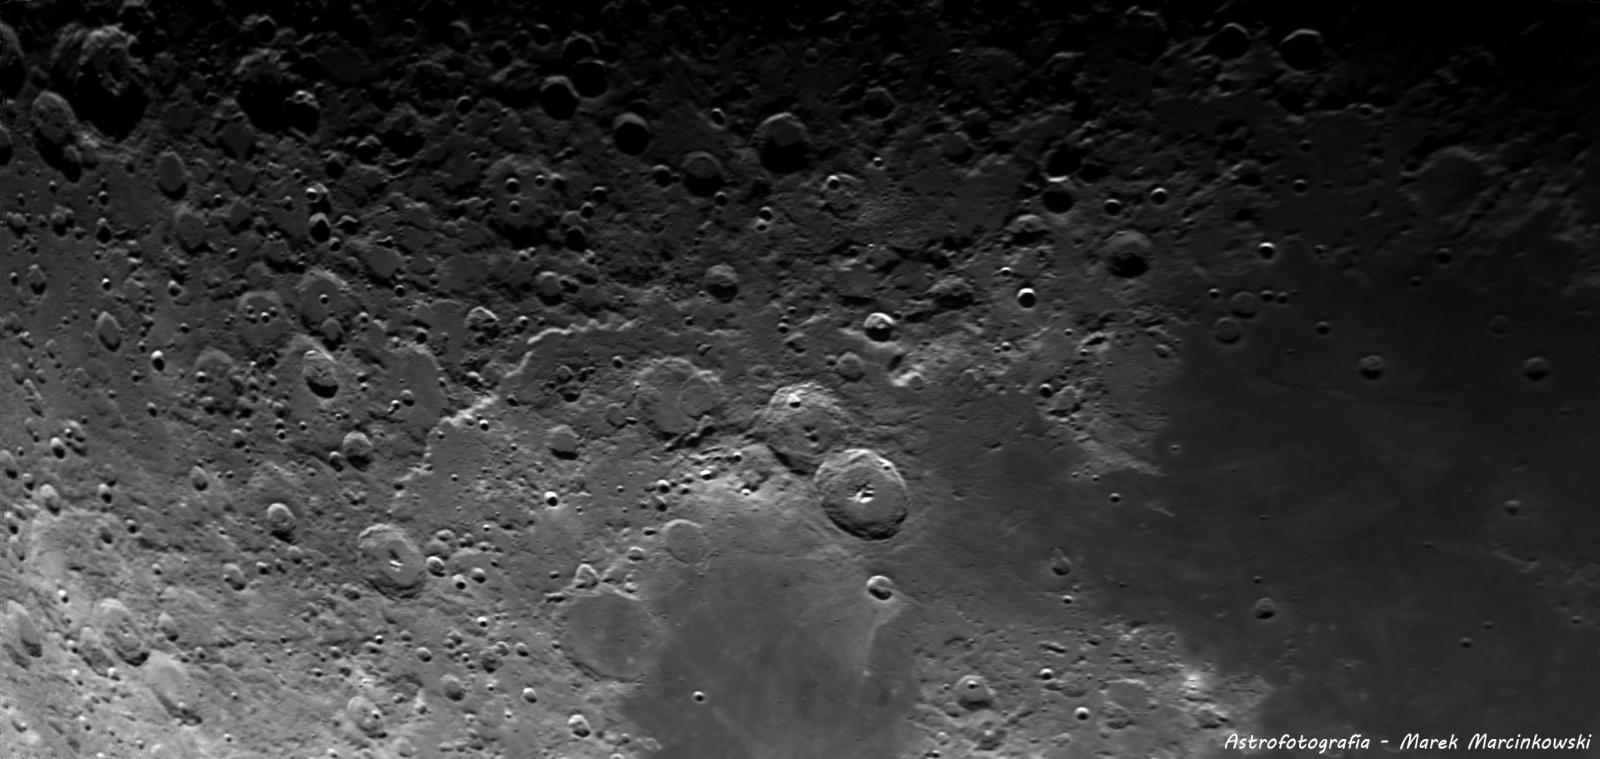 2020-12-21-1633_2-Saturn_lapl4_ap265_conv_ps_Astropolis.jpg